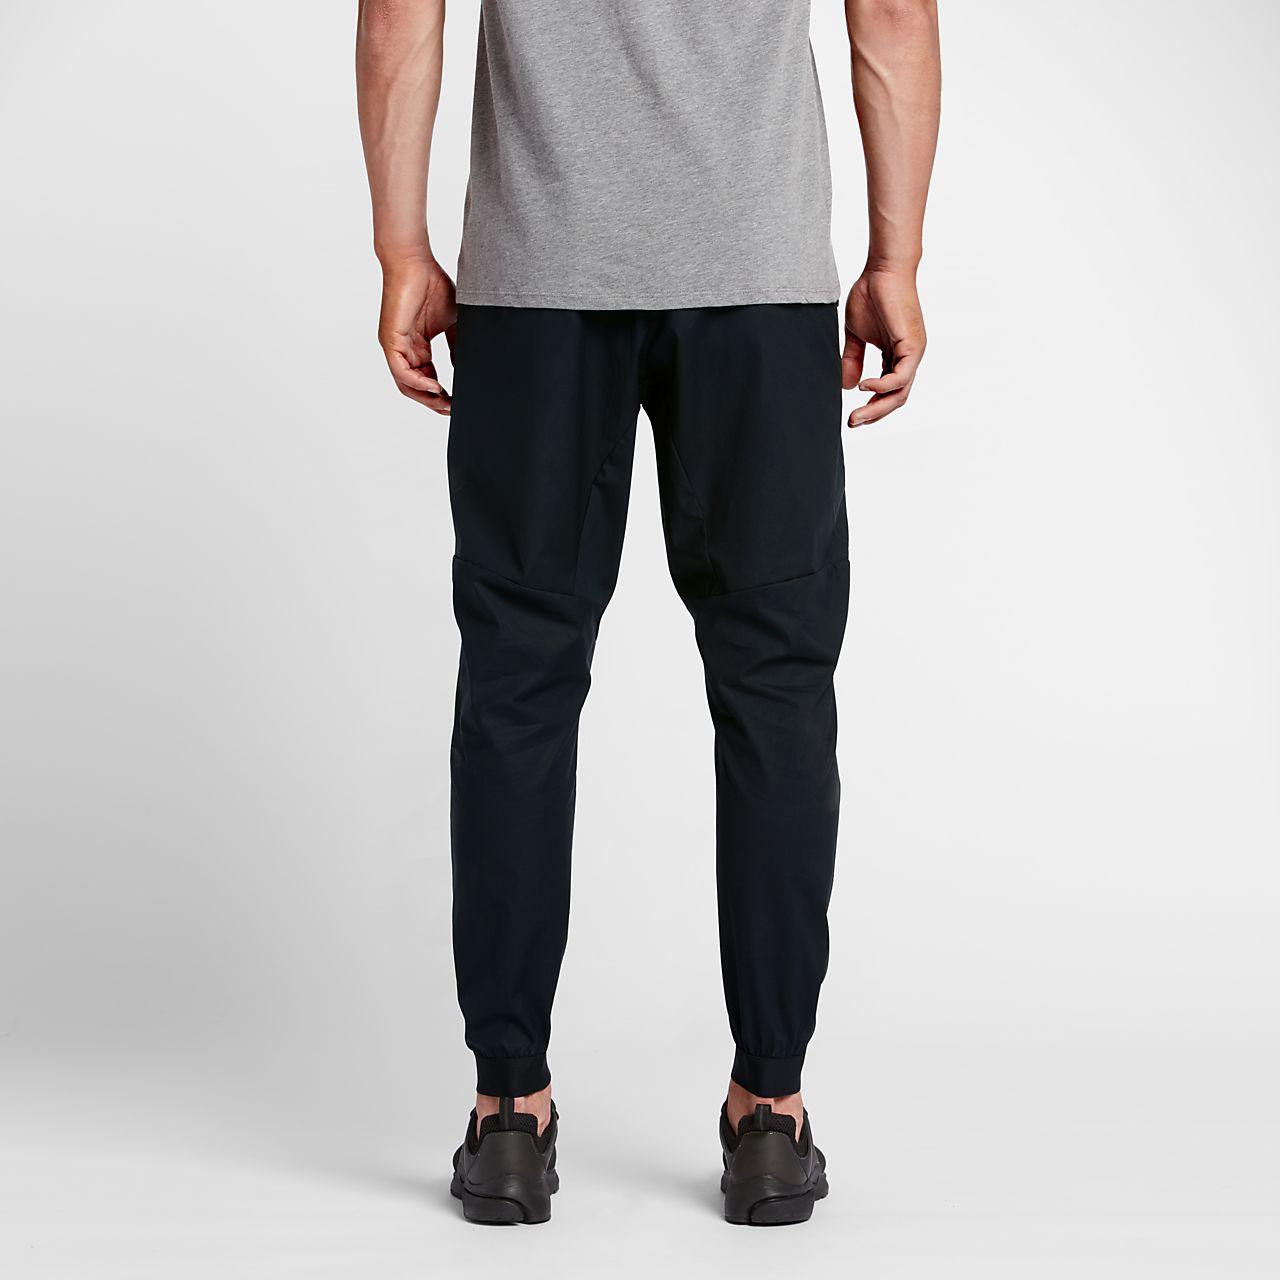 Nike Store Men's Pants